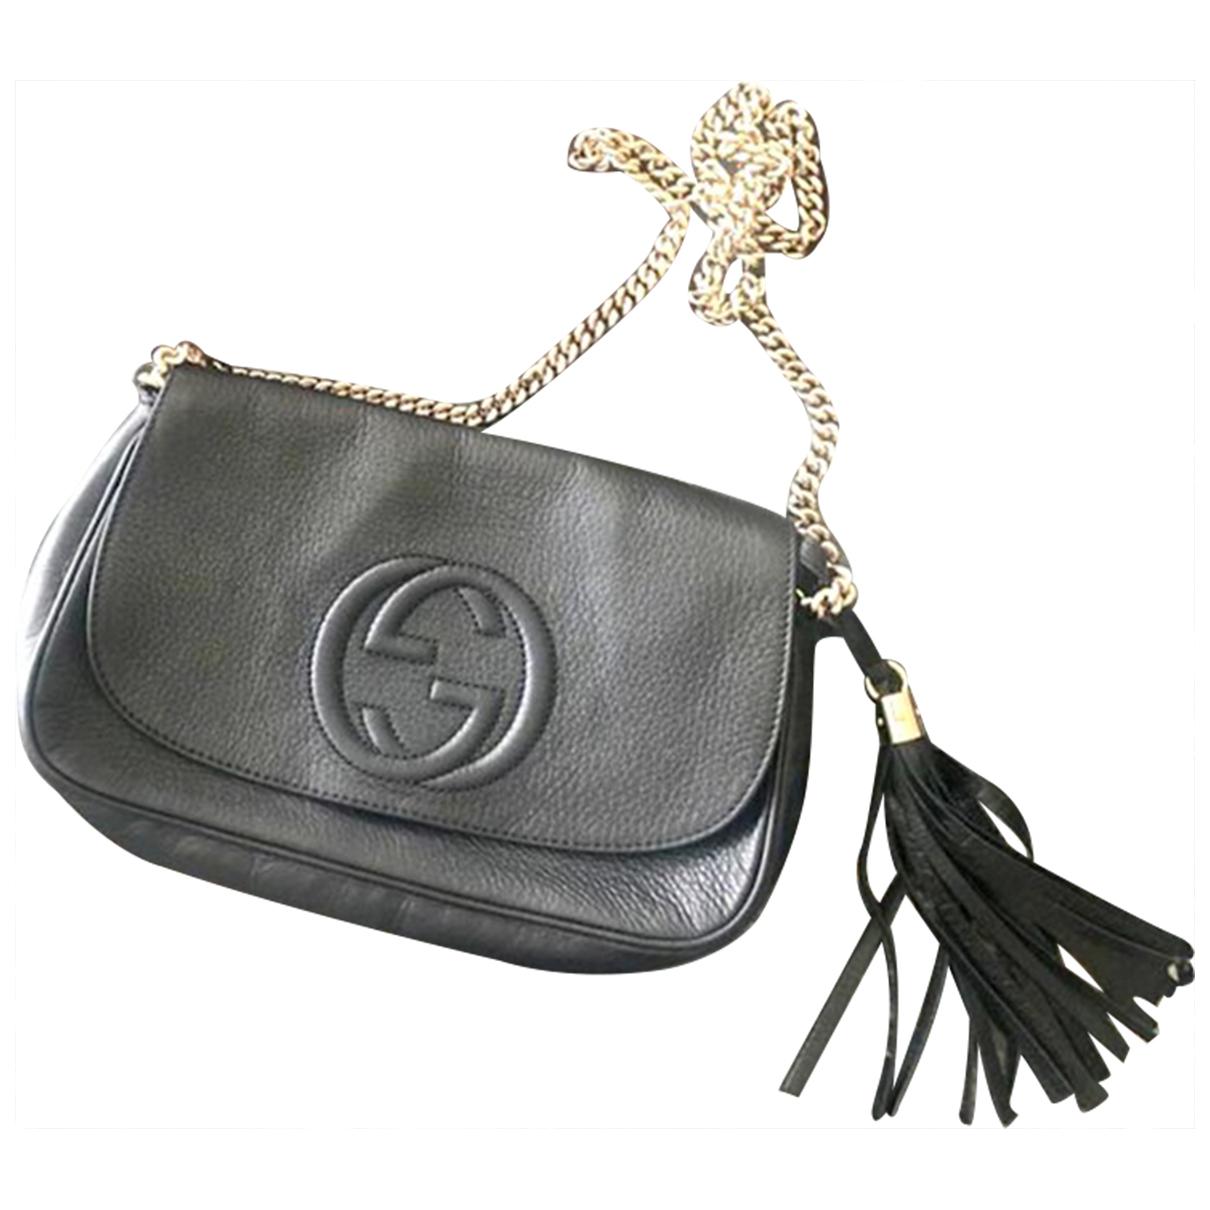 Gucci Soho Black Leather handbag for Women N